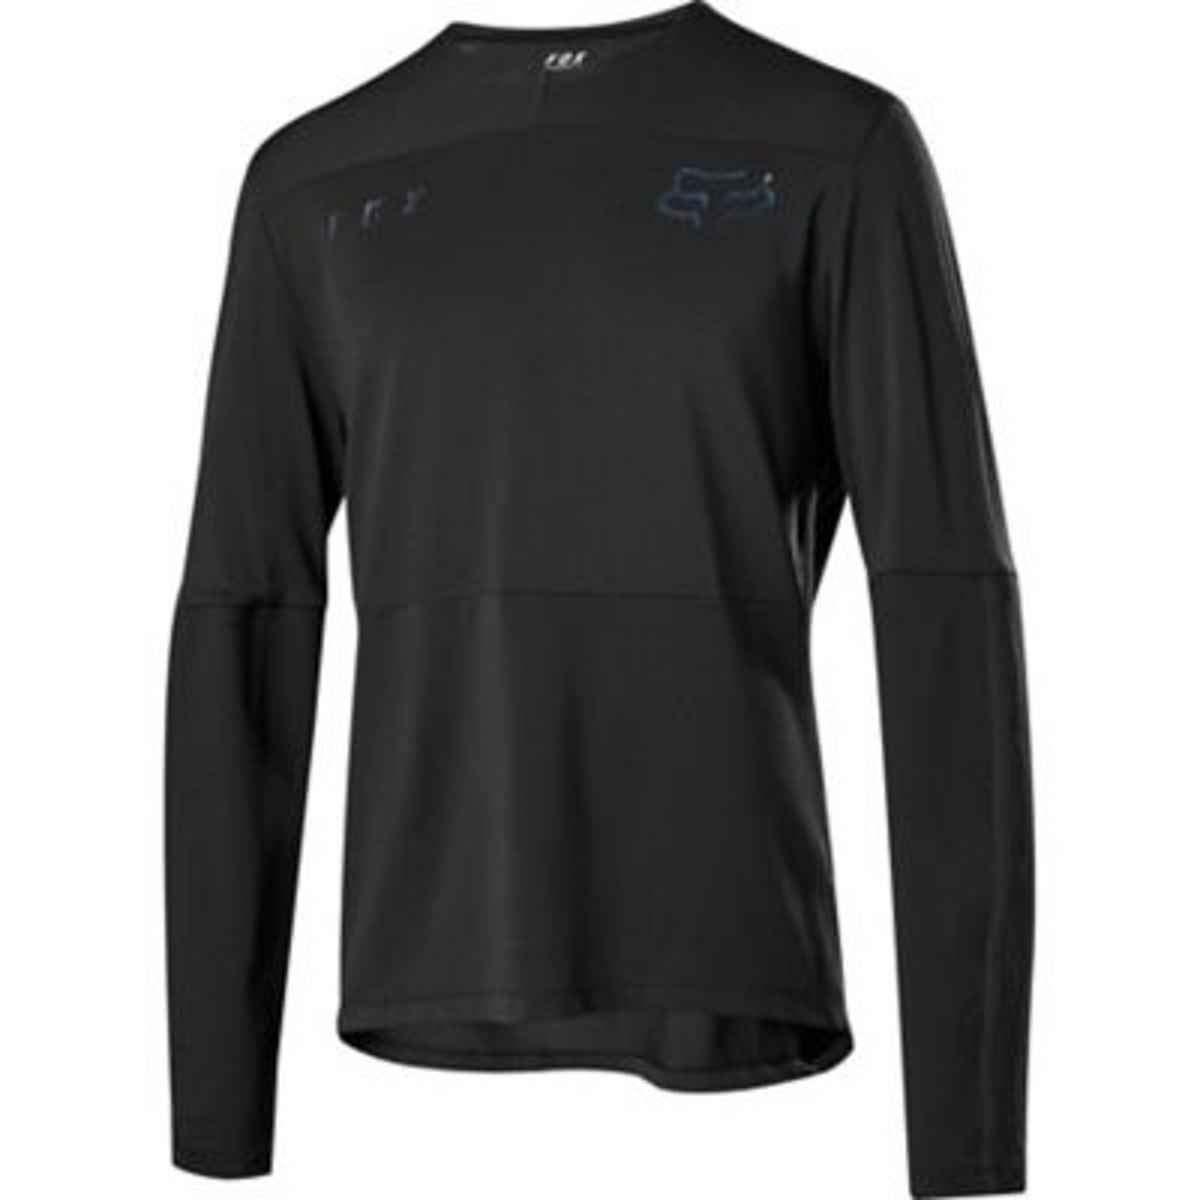 online store dd8fc 2967f Amazon.com: Fox Racing Defend Delta Long-Sleeve Jersey ...